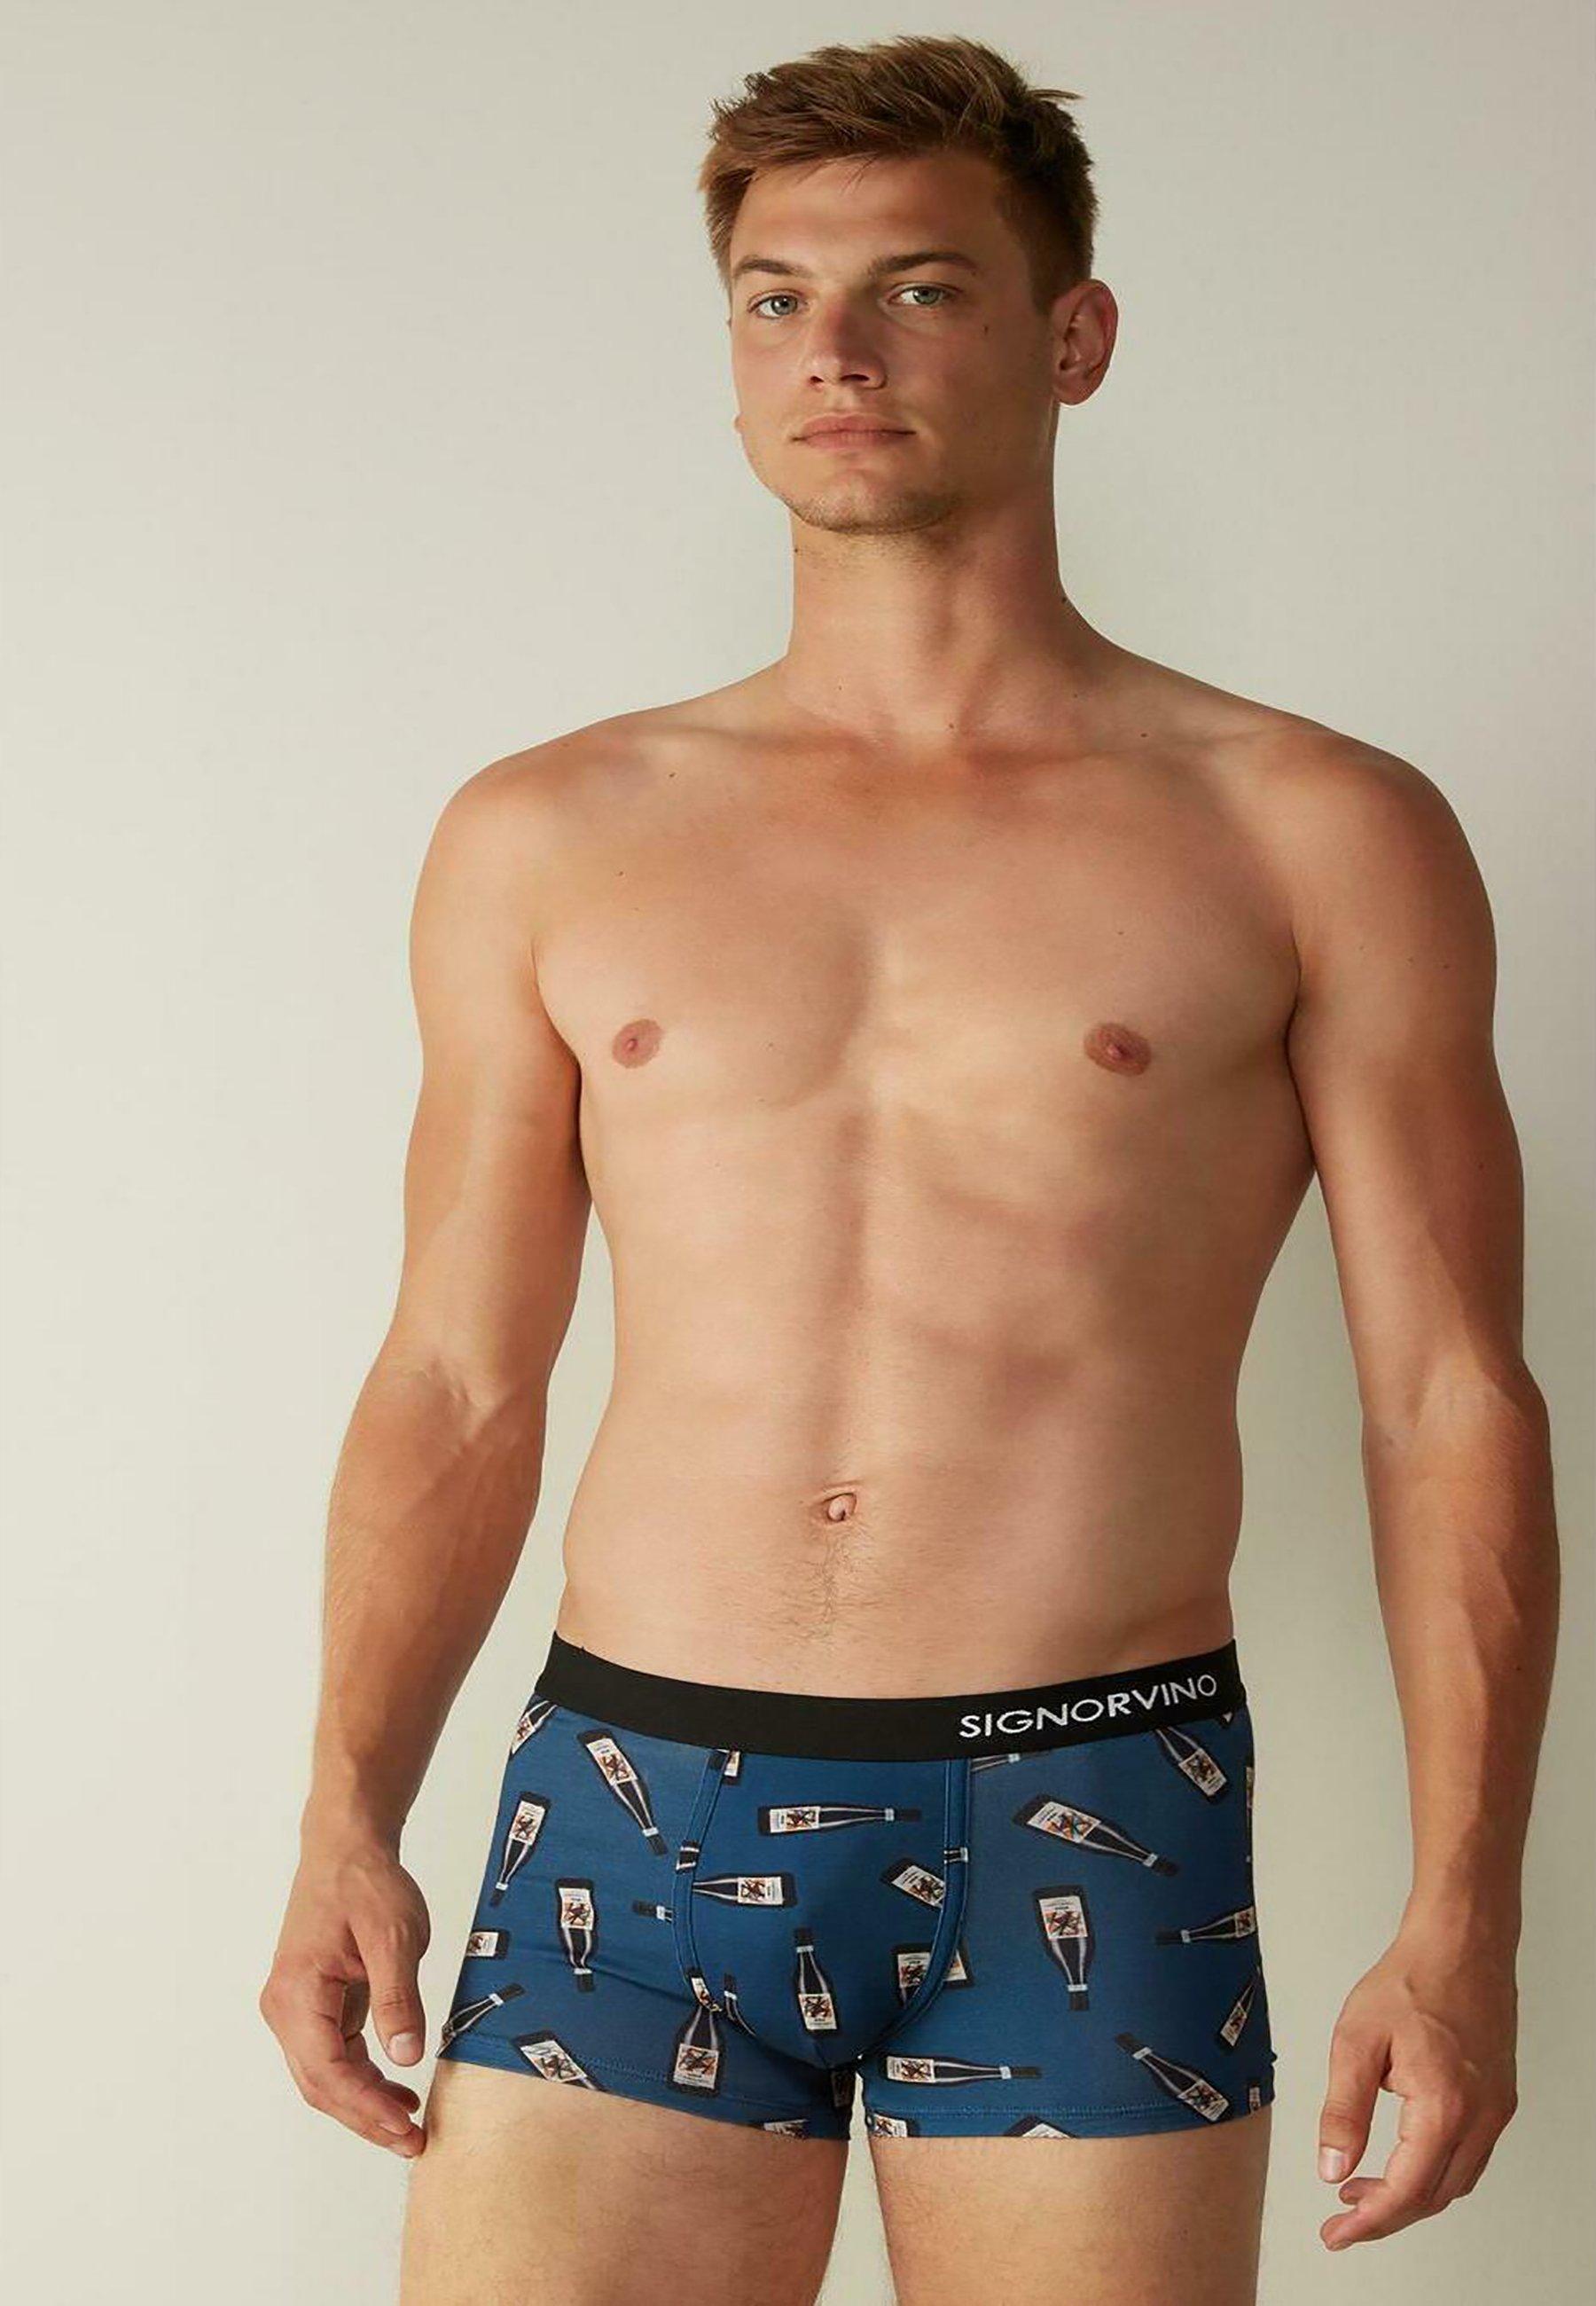 Herren SIGNORVINO  - Panties - blau